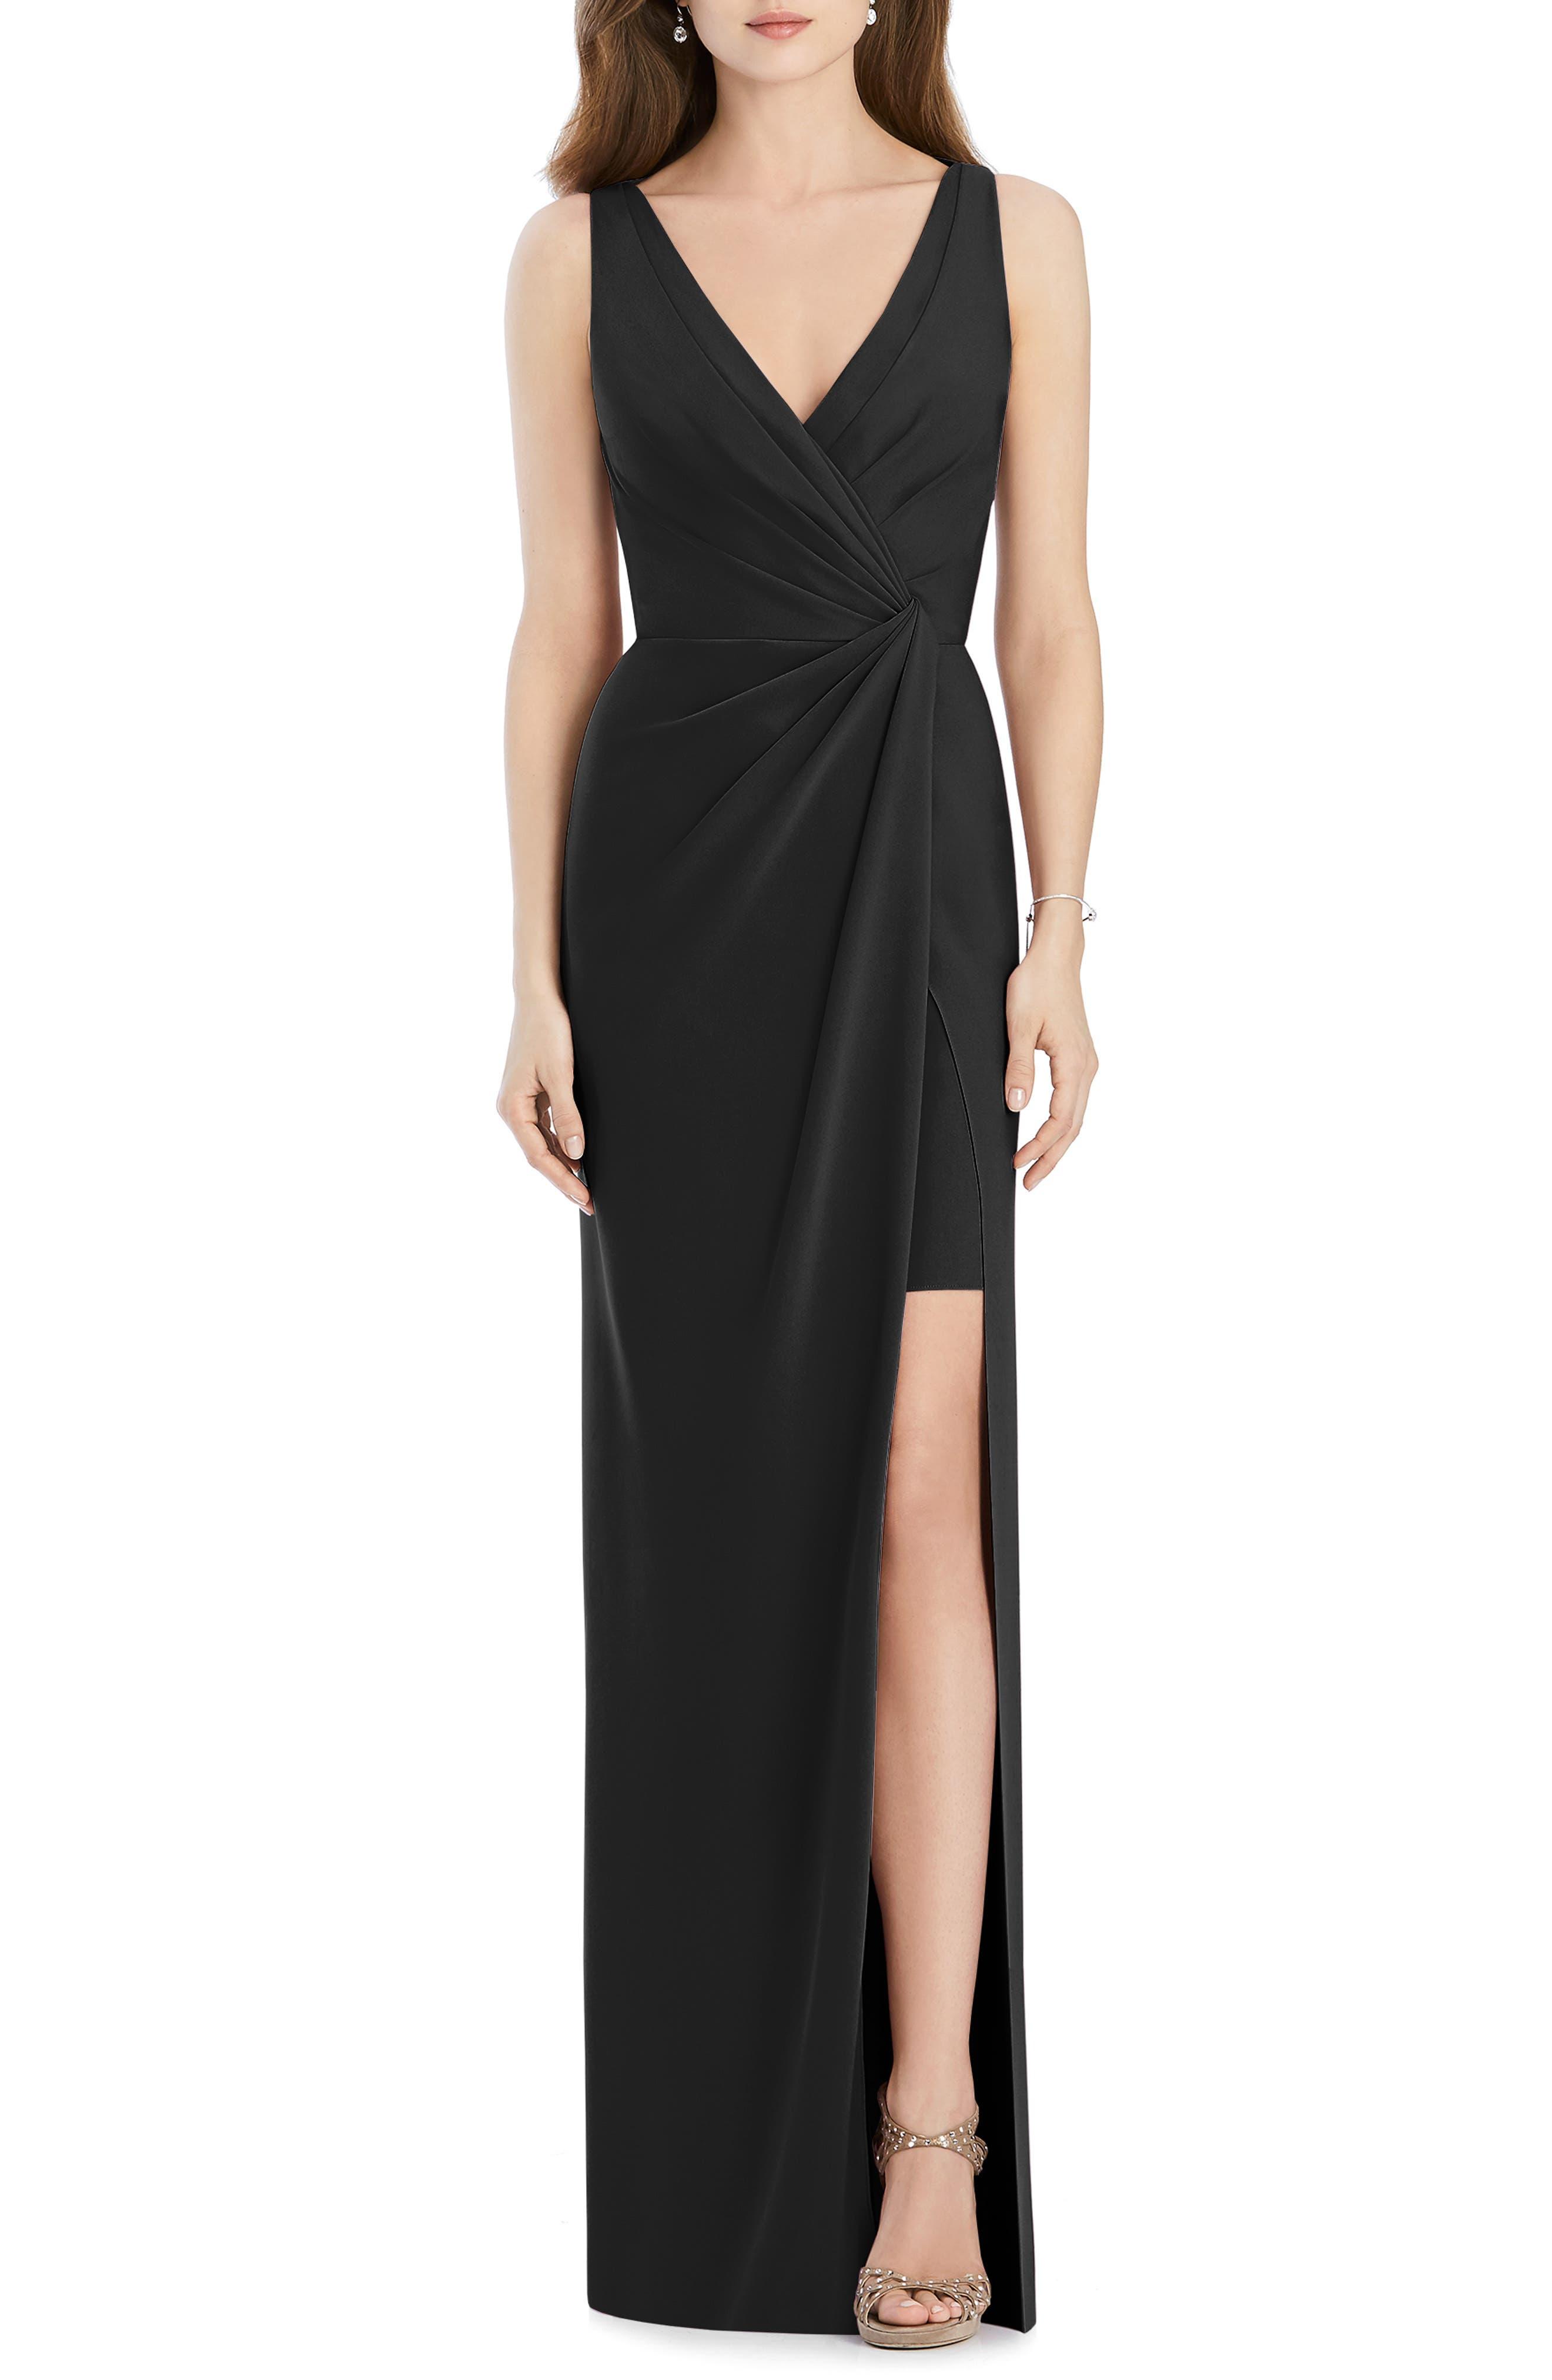 JENNY PACKHAM, Crepe Column Gown, Main thumbnail 1, color, BLACK